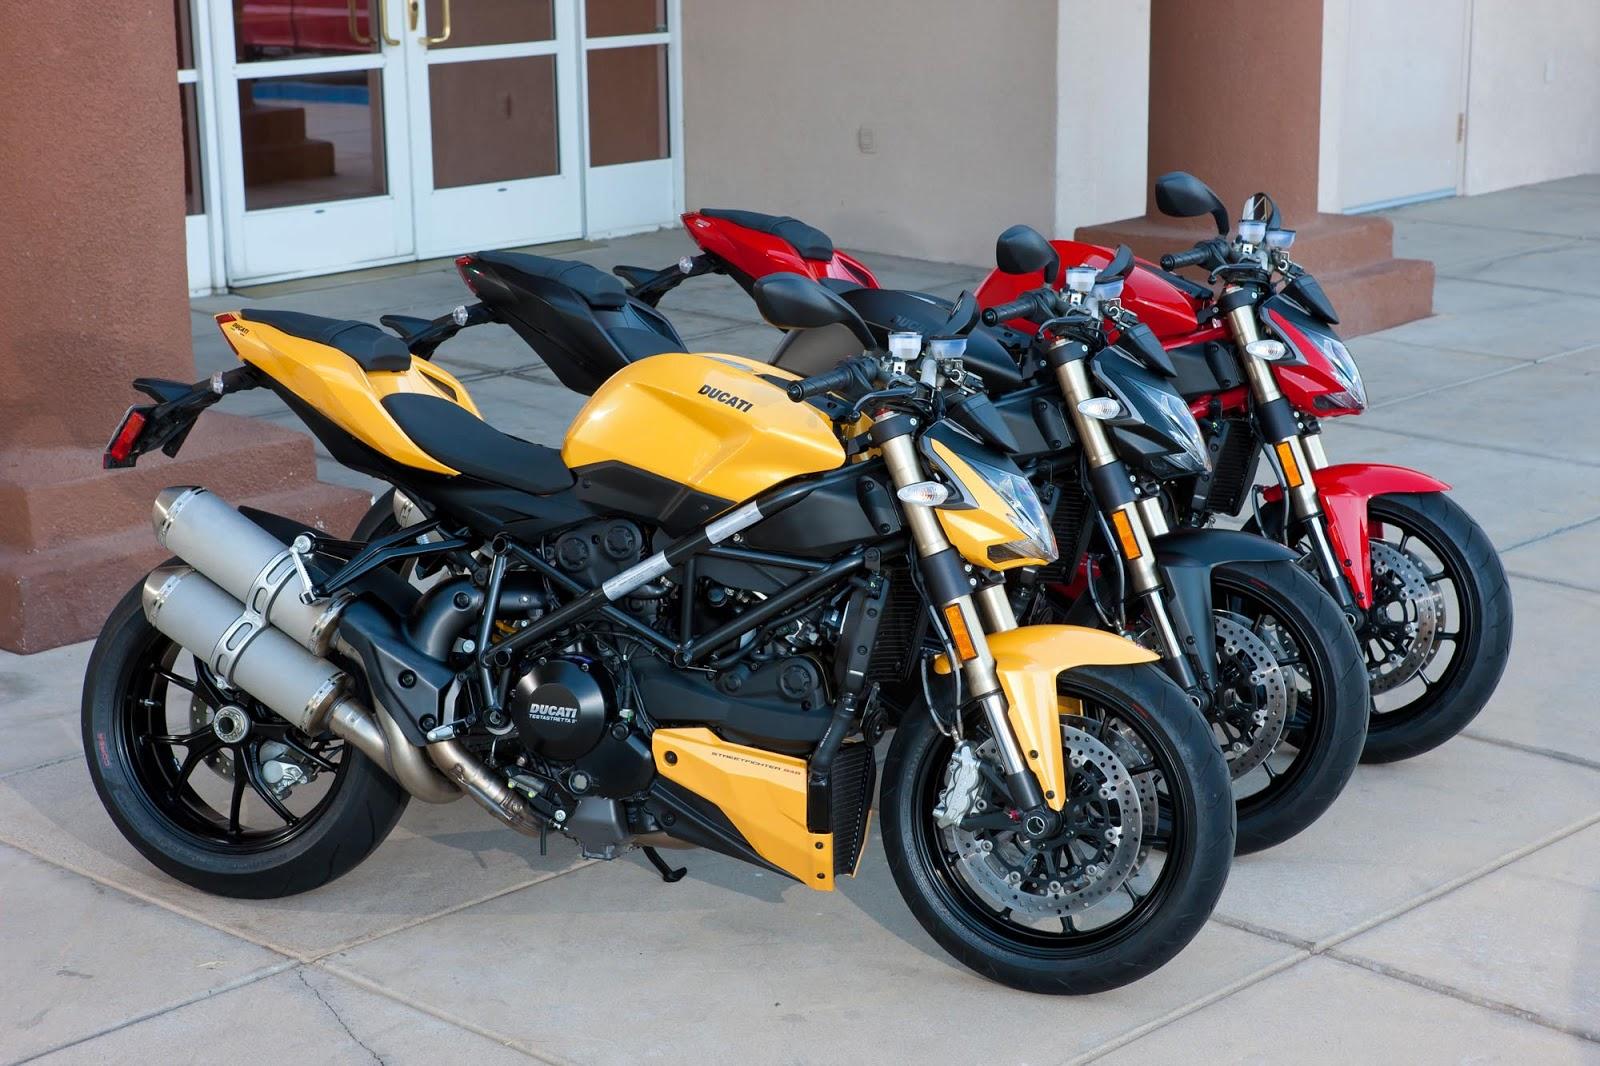 fotos de motos fotos da moto ducati streetfighter. Black Bedroom Furniture Sets. Home Design Ideas